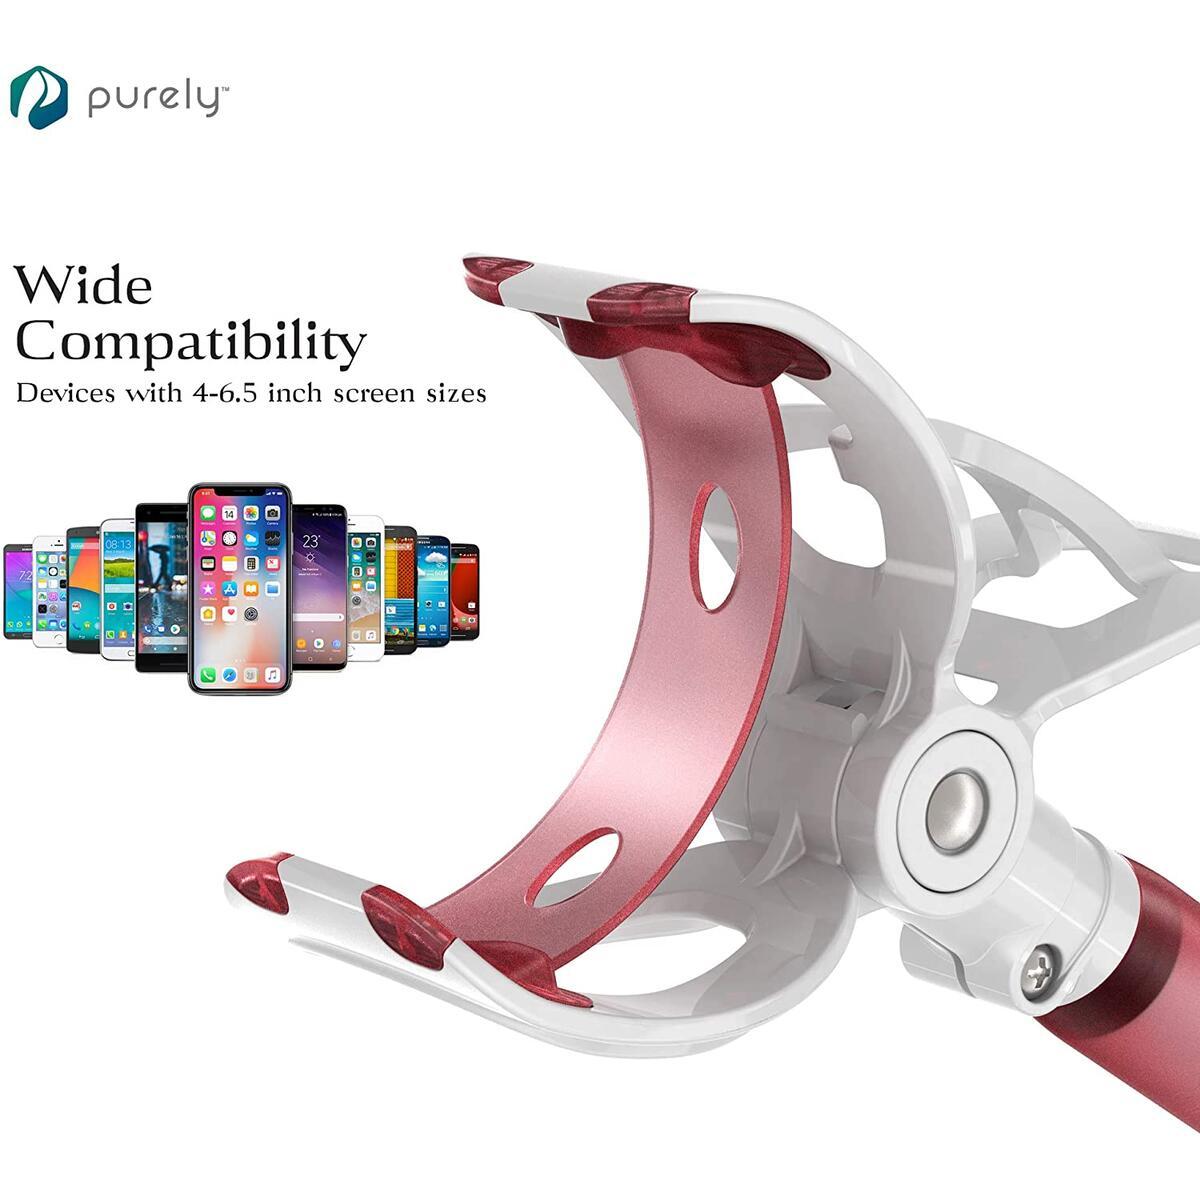 Gooseneck Phone & Tablet Holder for Desk, Night Stand, Headboard - Pink